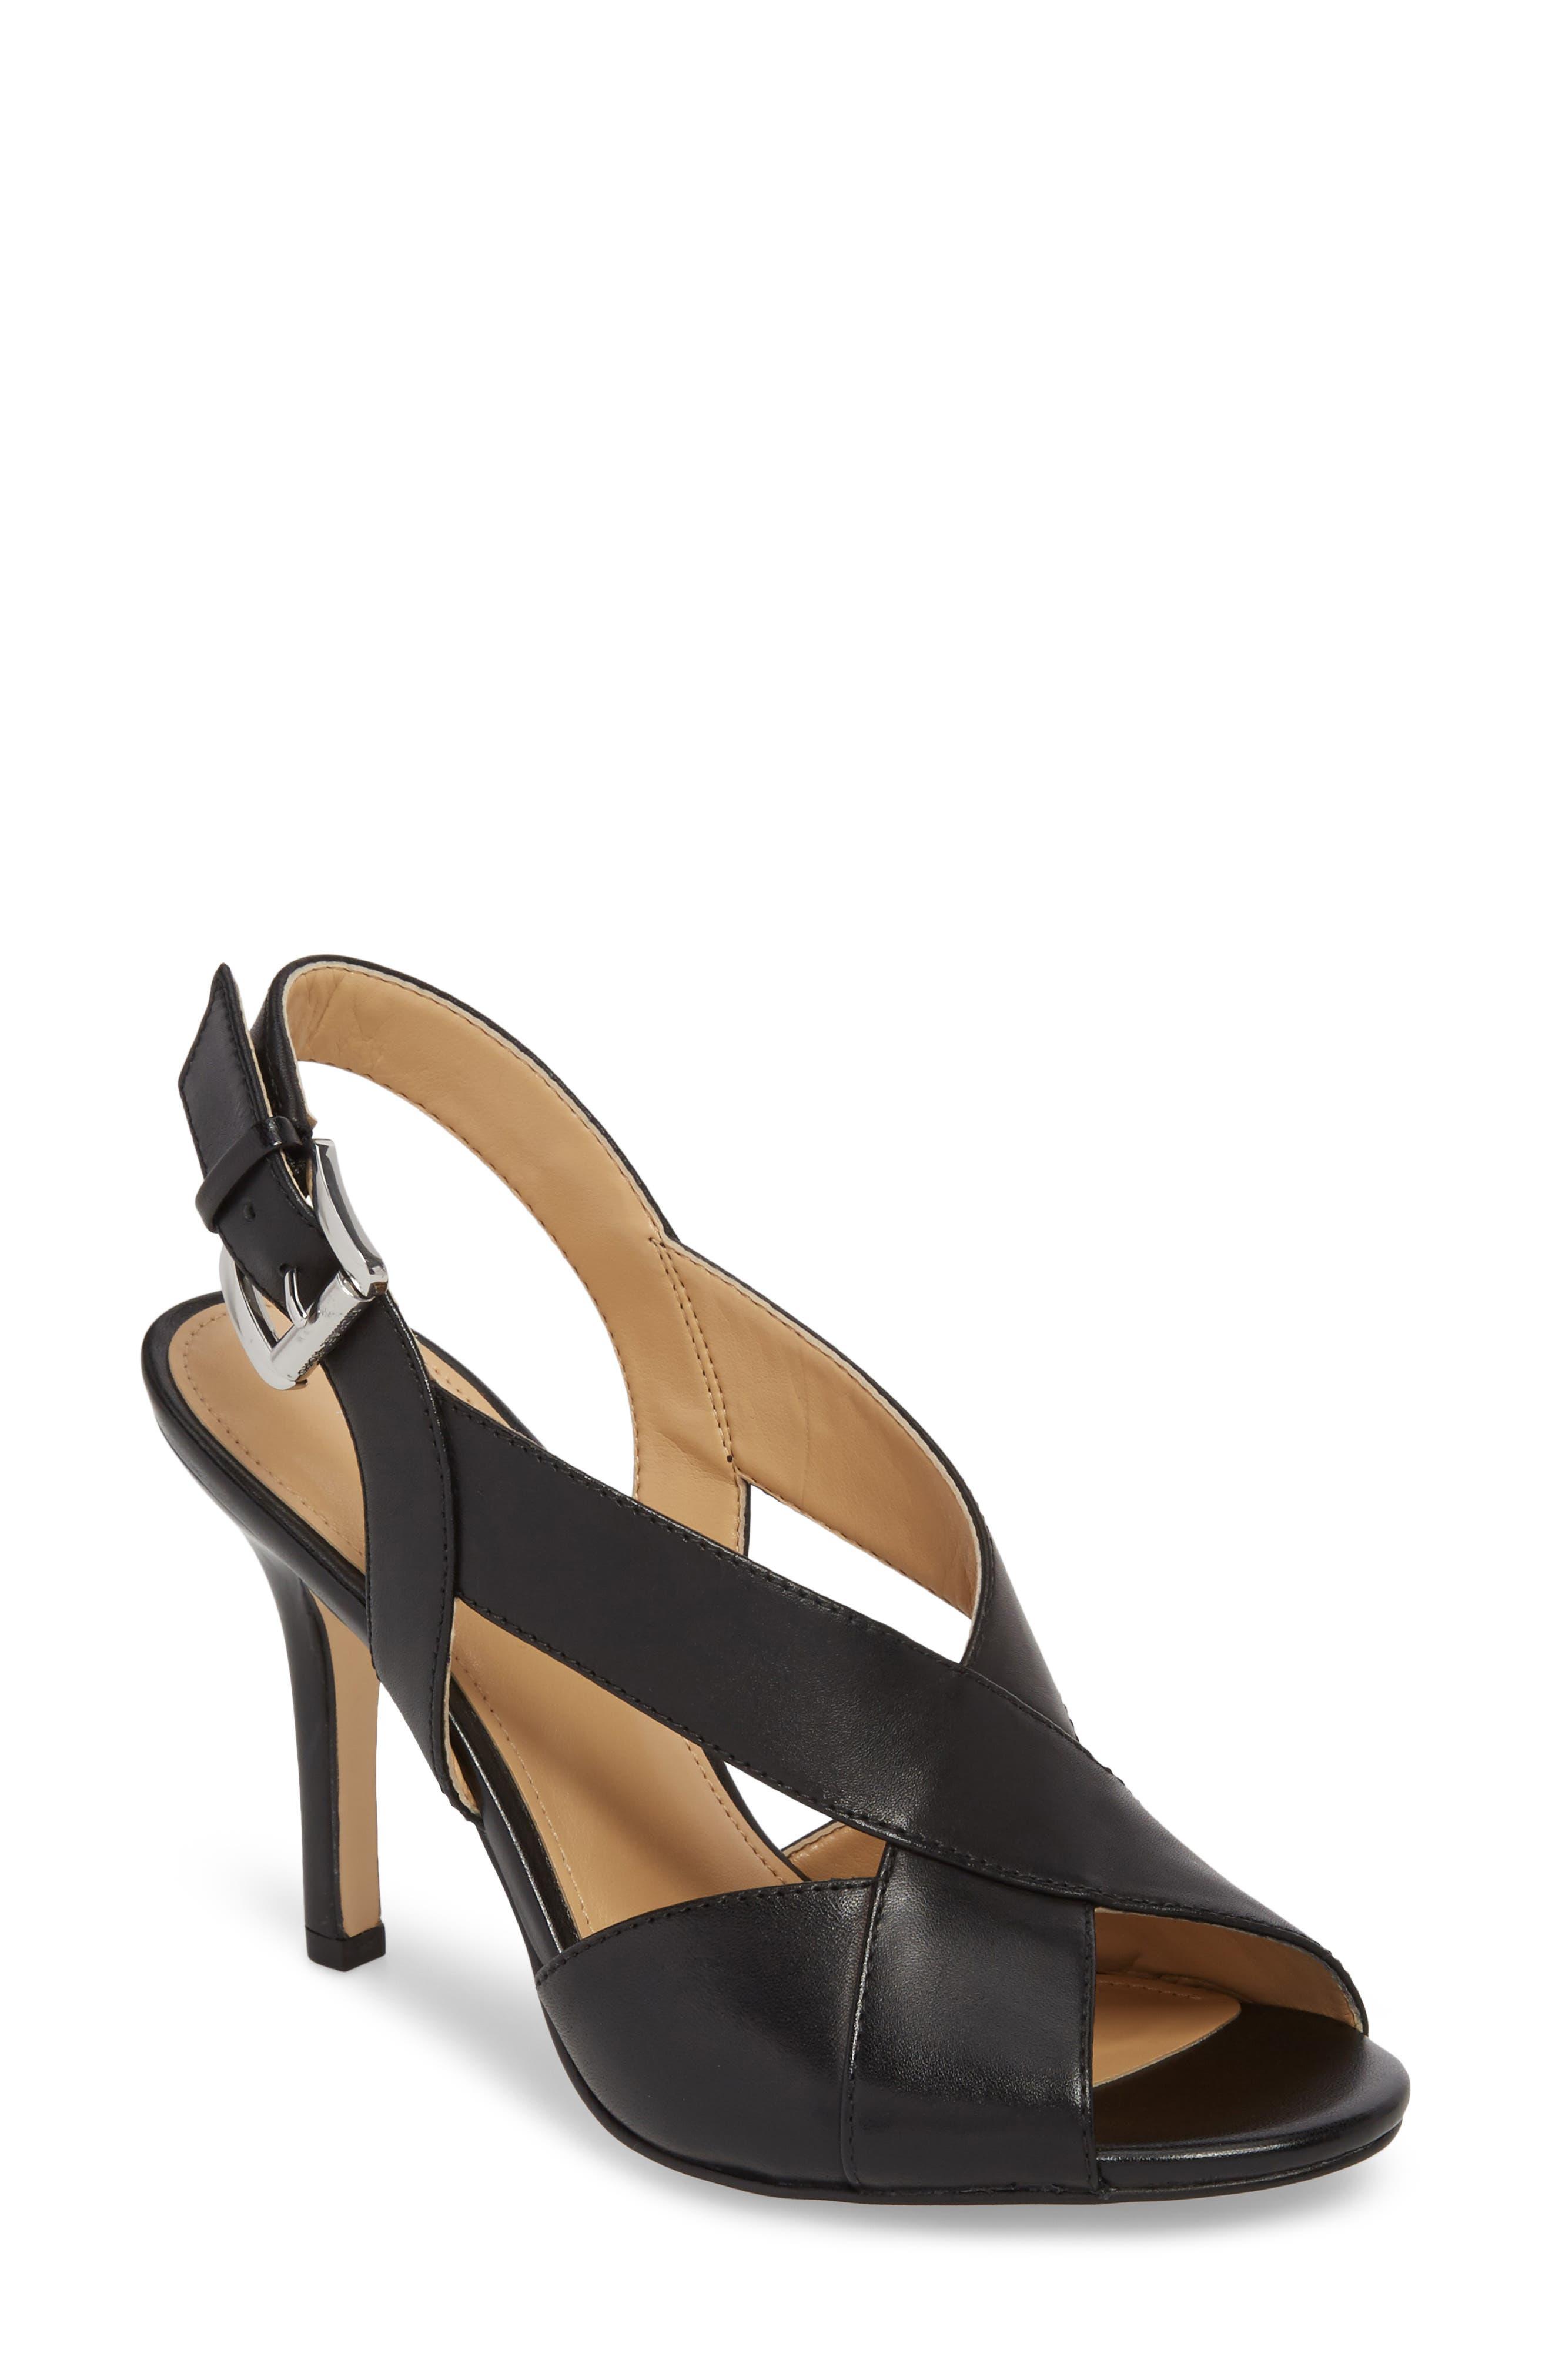 Becky Cross Strap Sandal,                         Main,                         color, BLACK LEATHER